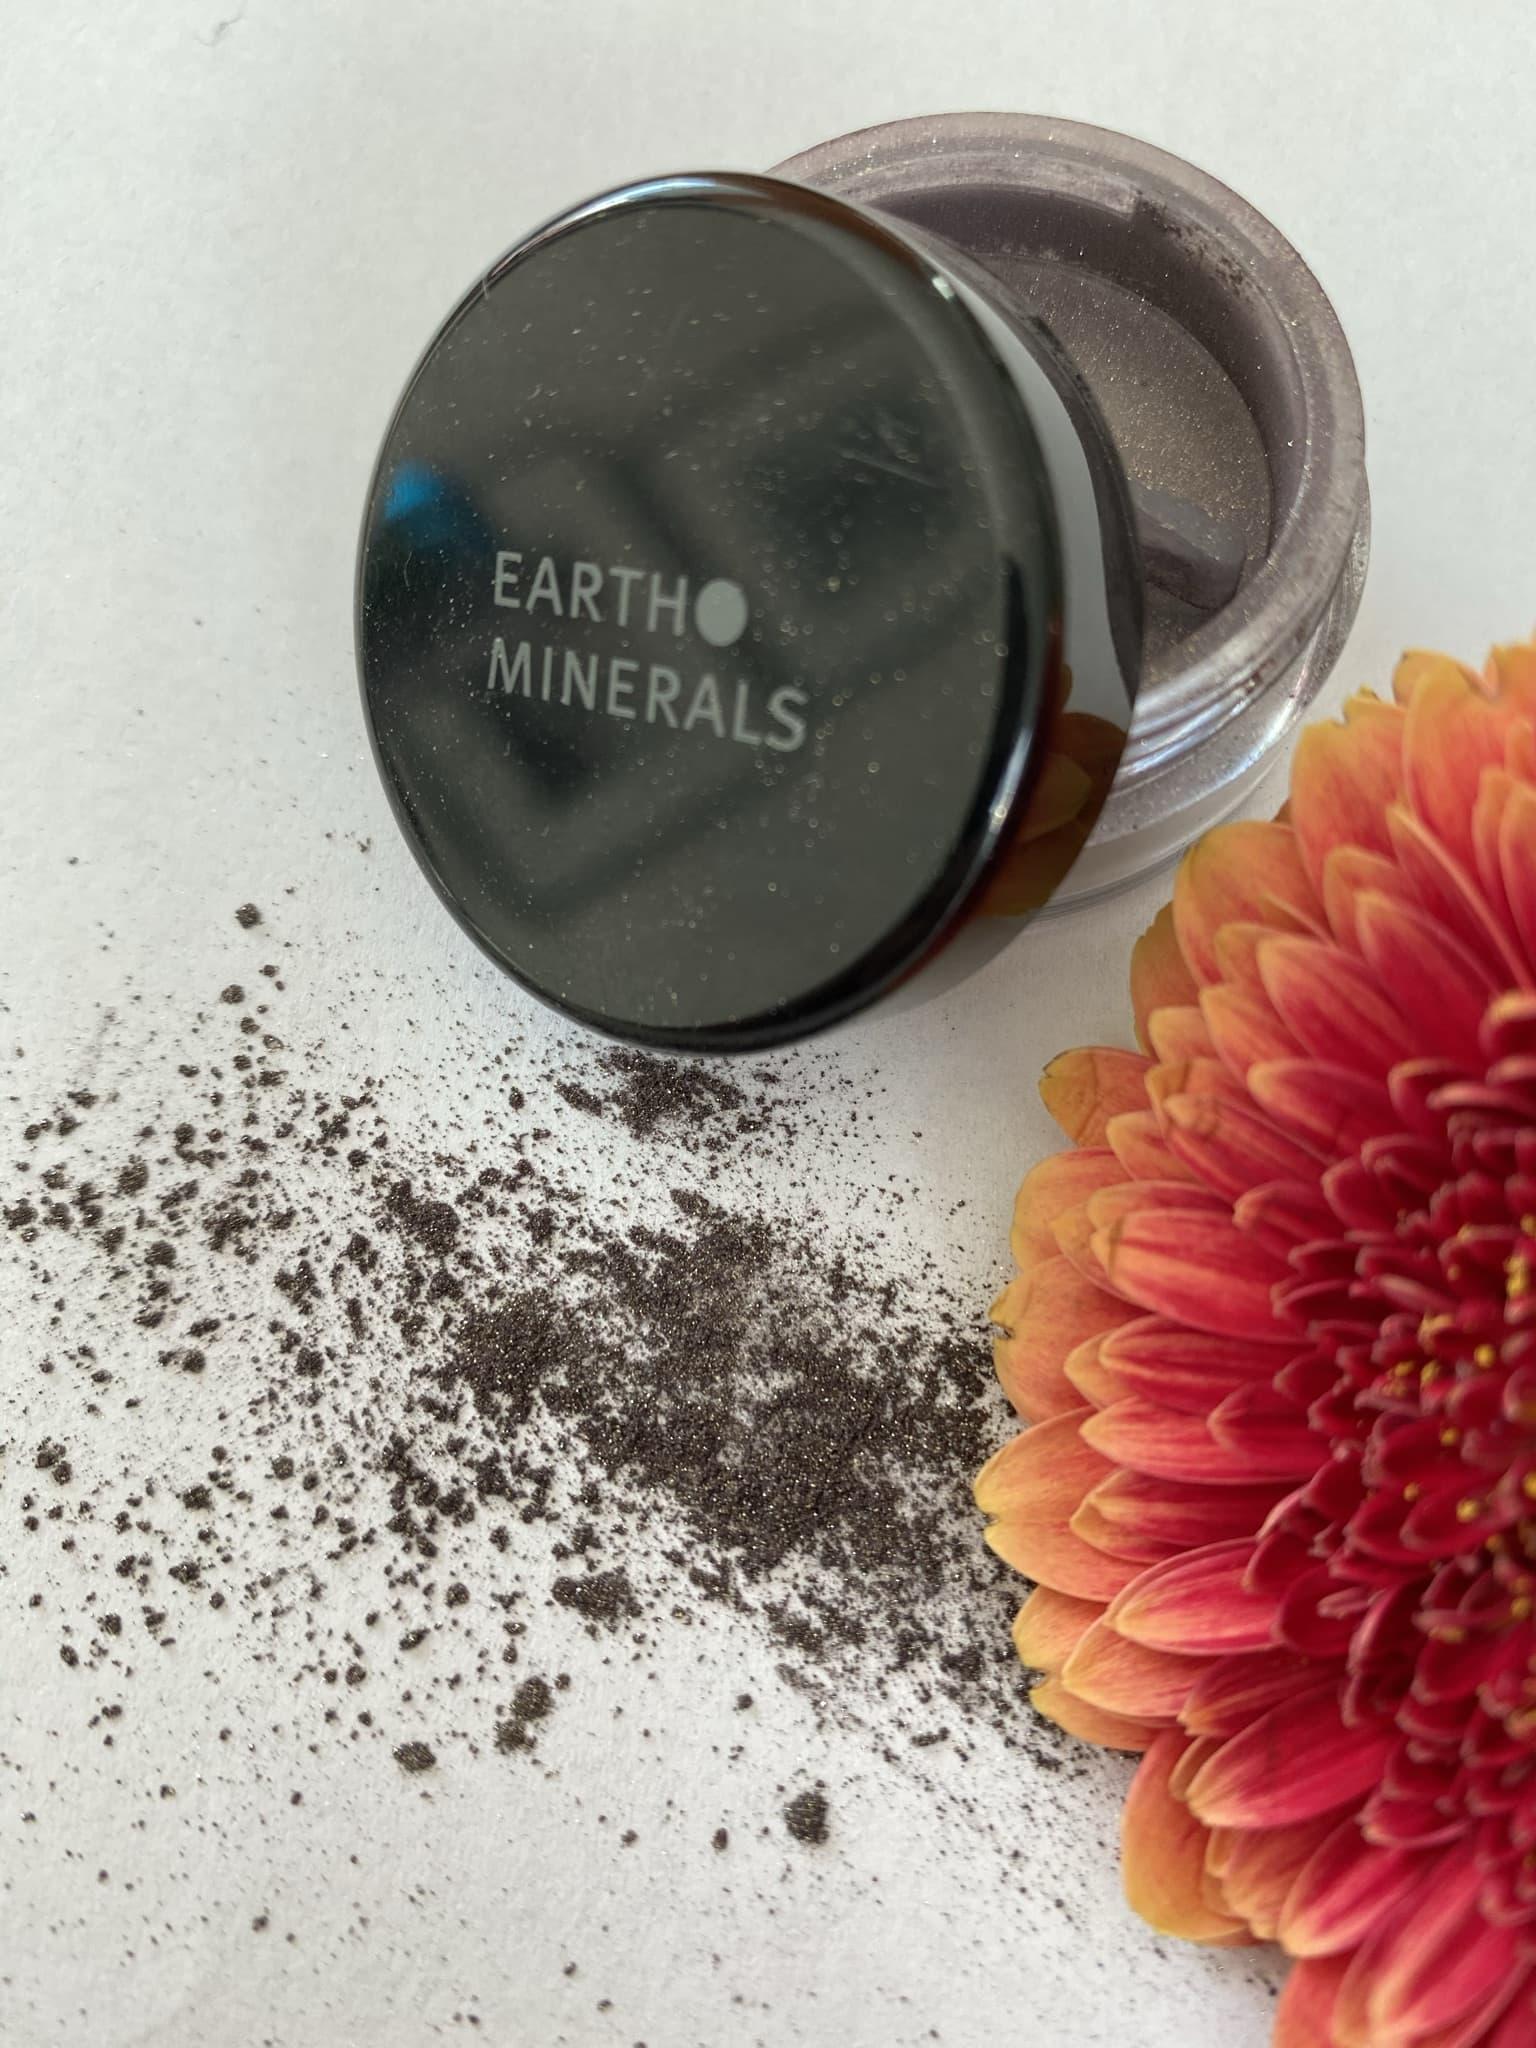 Earth Minerals Provida